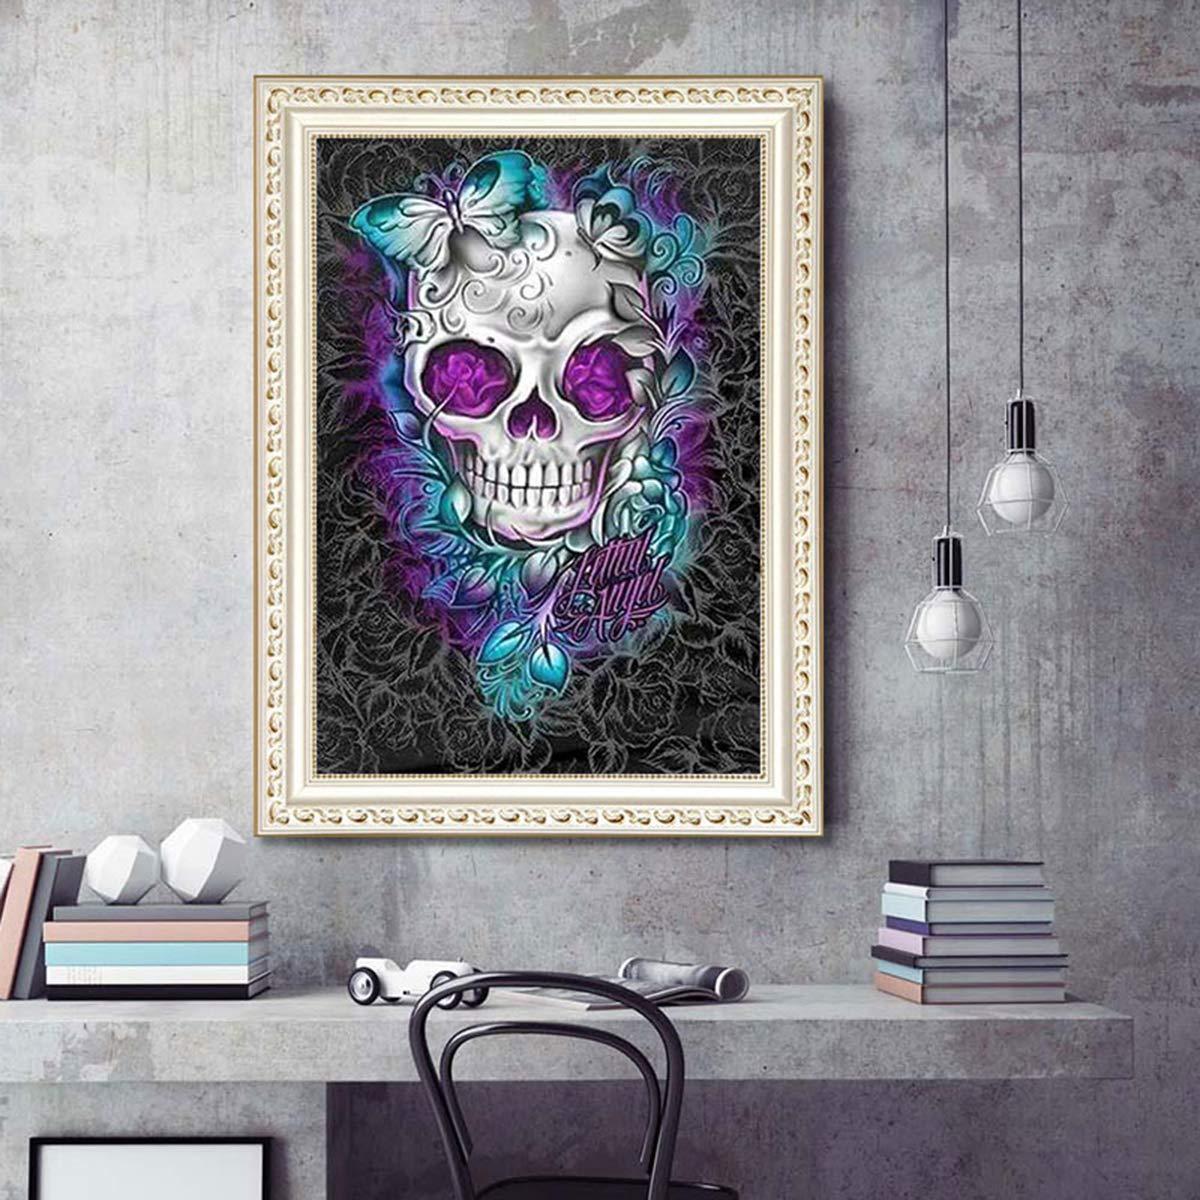 DIY 5D Full Drill Diamond Painting Kits for Adults Kids Crystal Rhinestone Diamond Embroidery Paintings Arts Craft Home Wall Decor Skull, 30x40CM